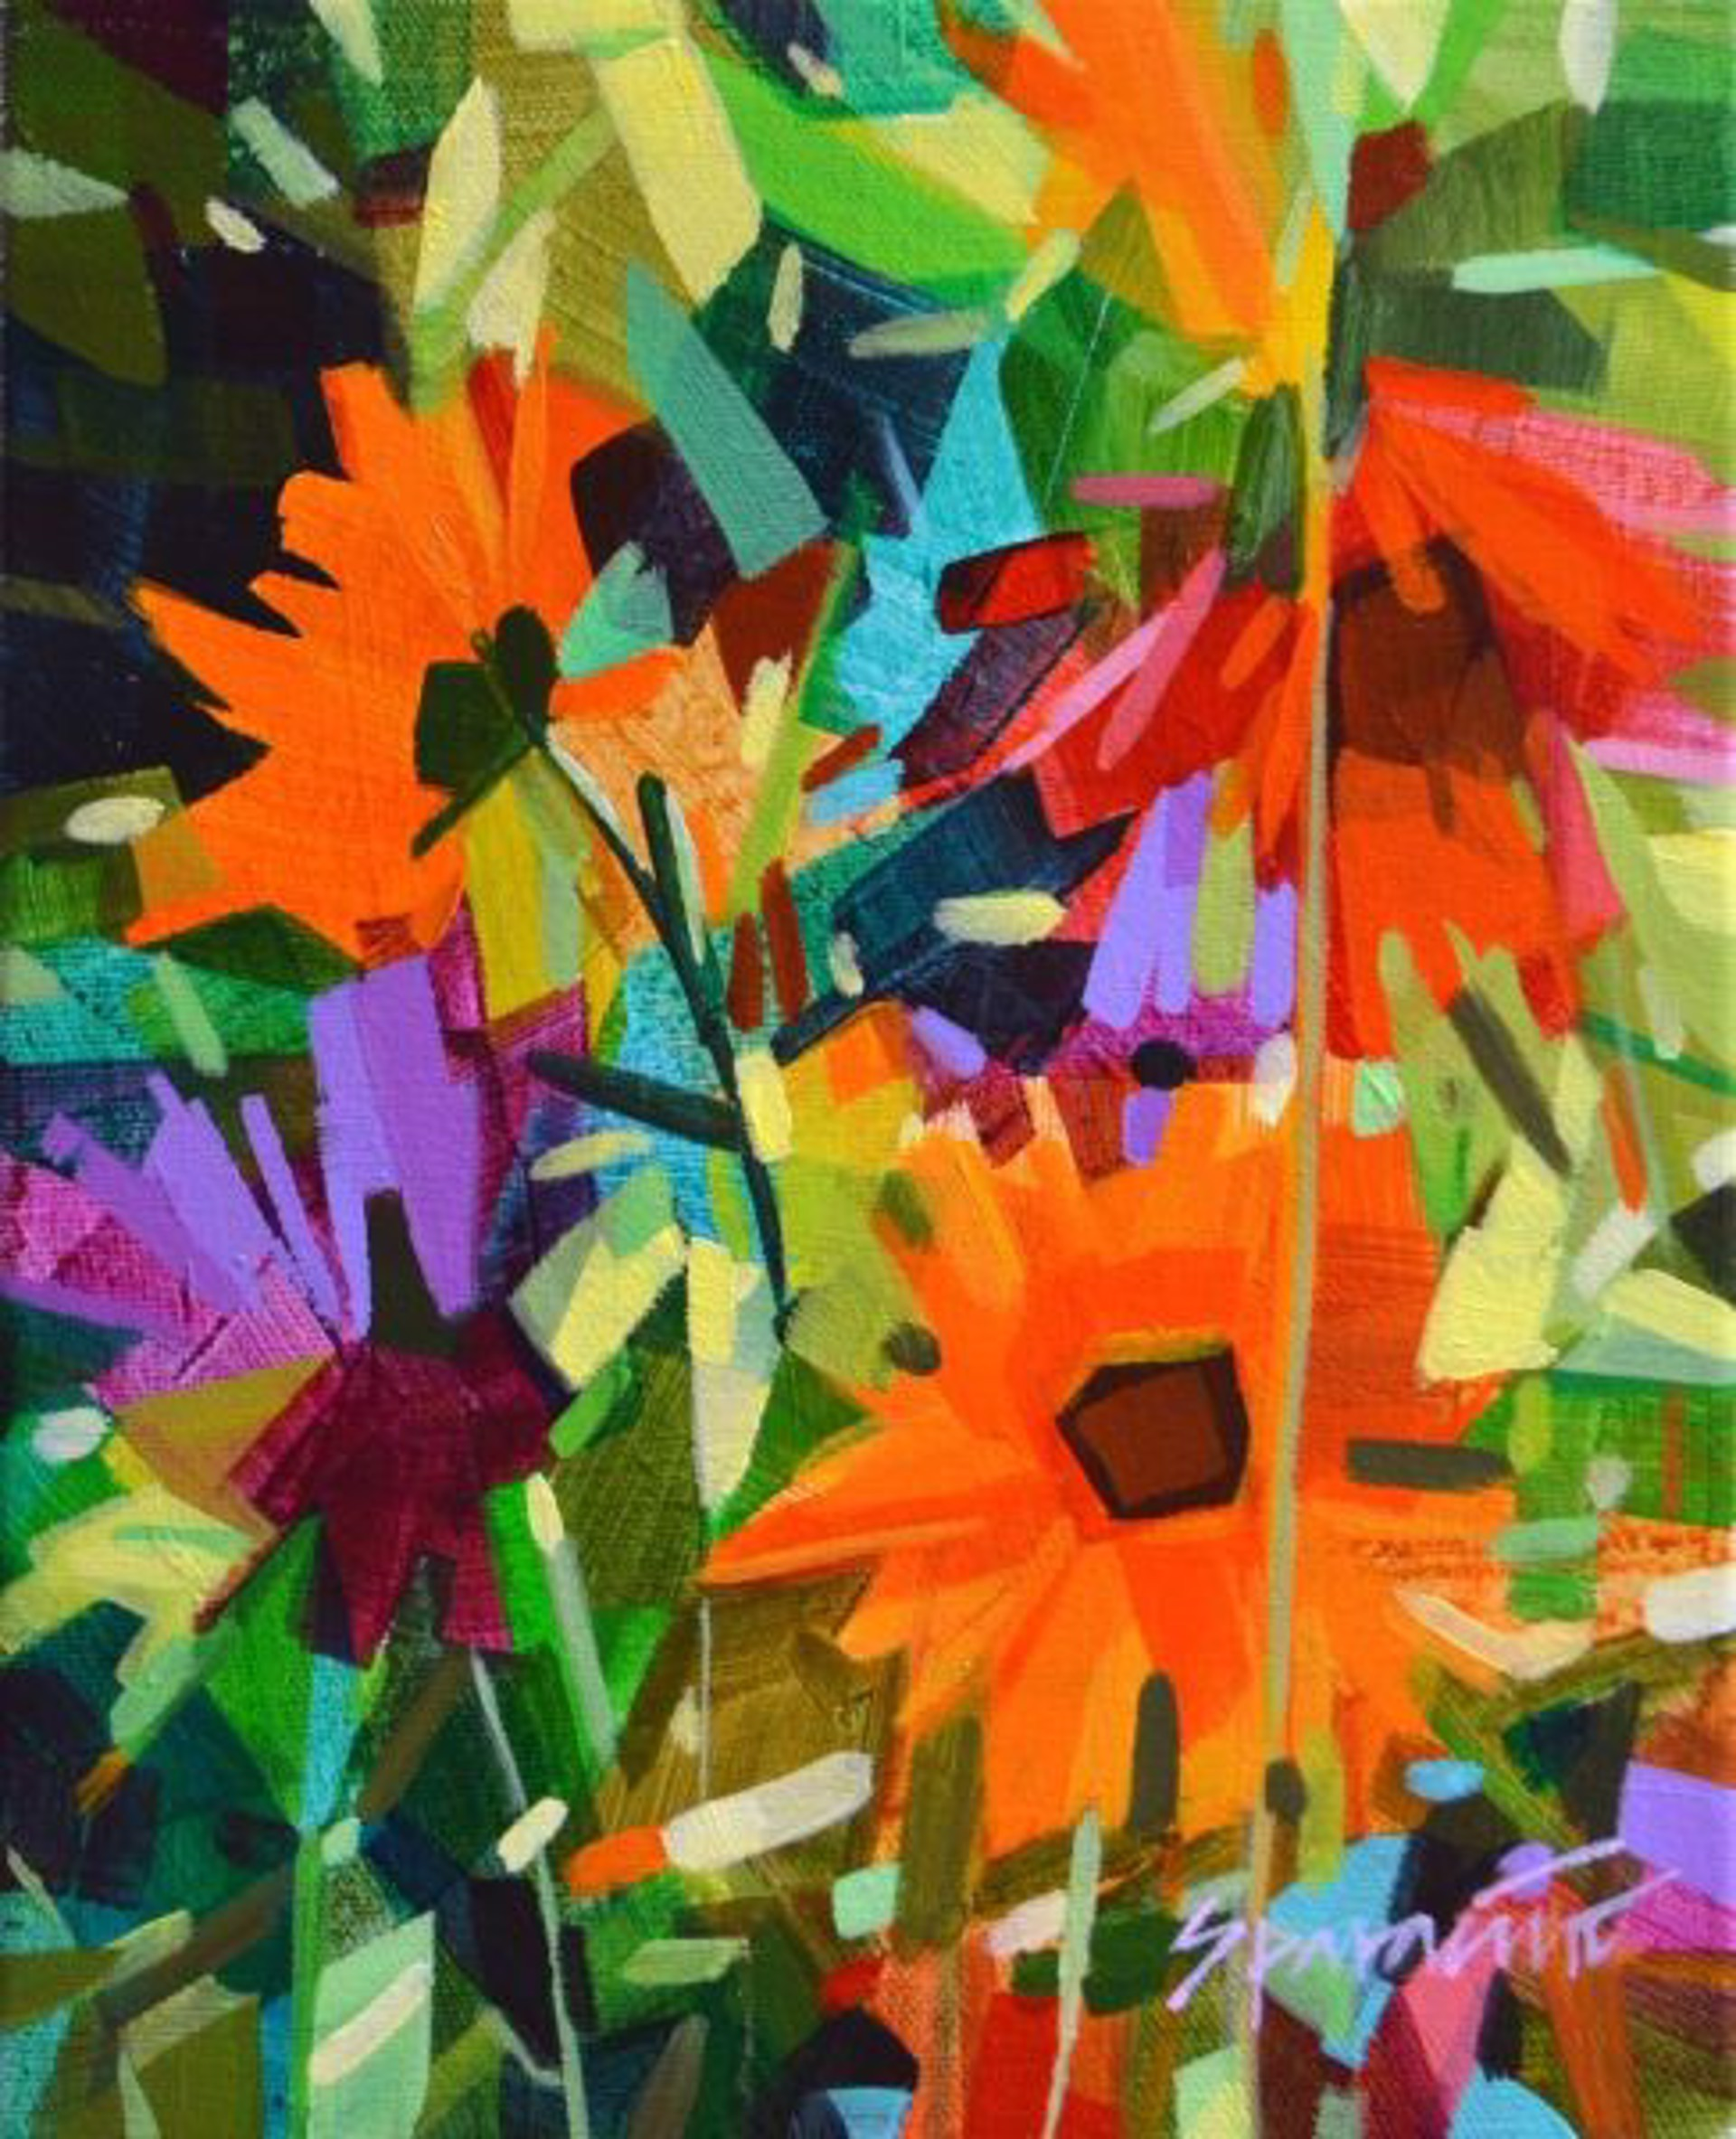 Wild Daisy Garden by JENNIFER SPARACINO